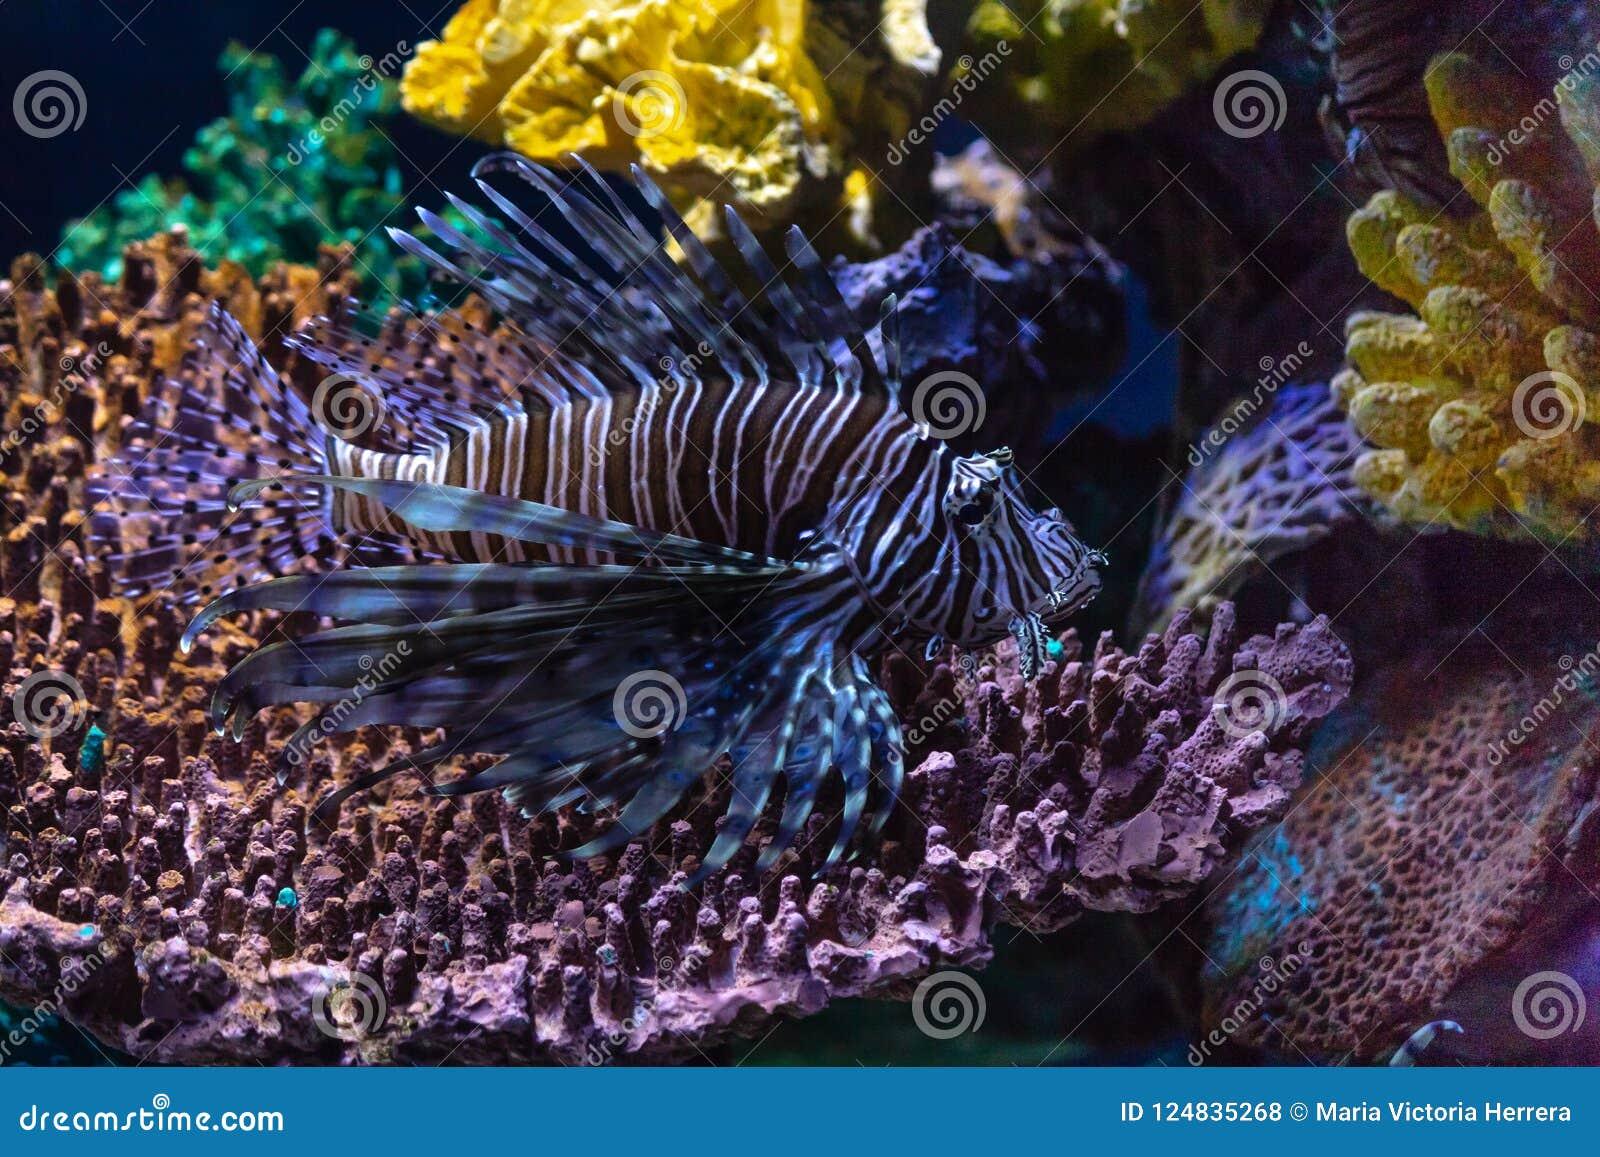 Lionfishinvasion i det karibiskt